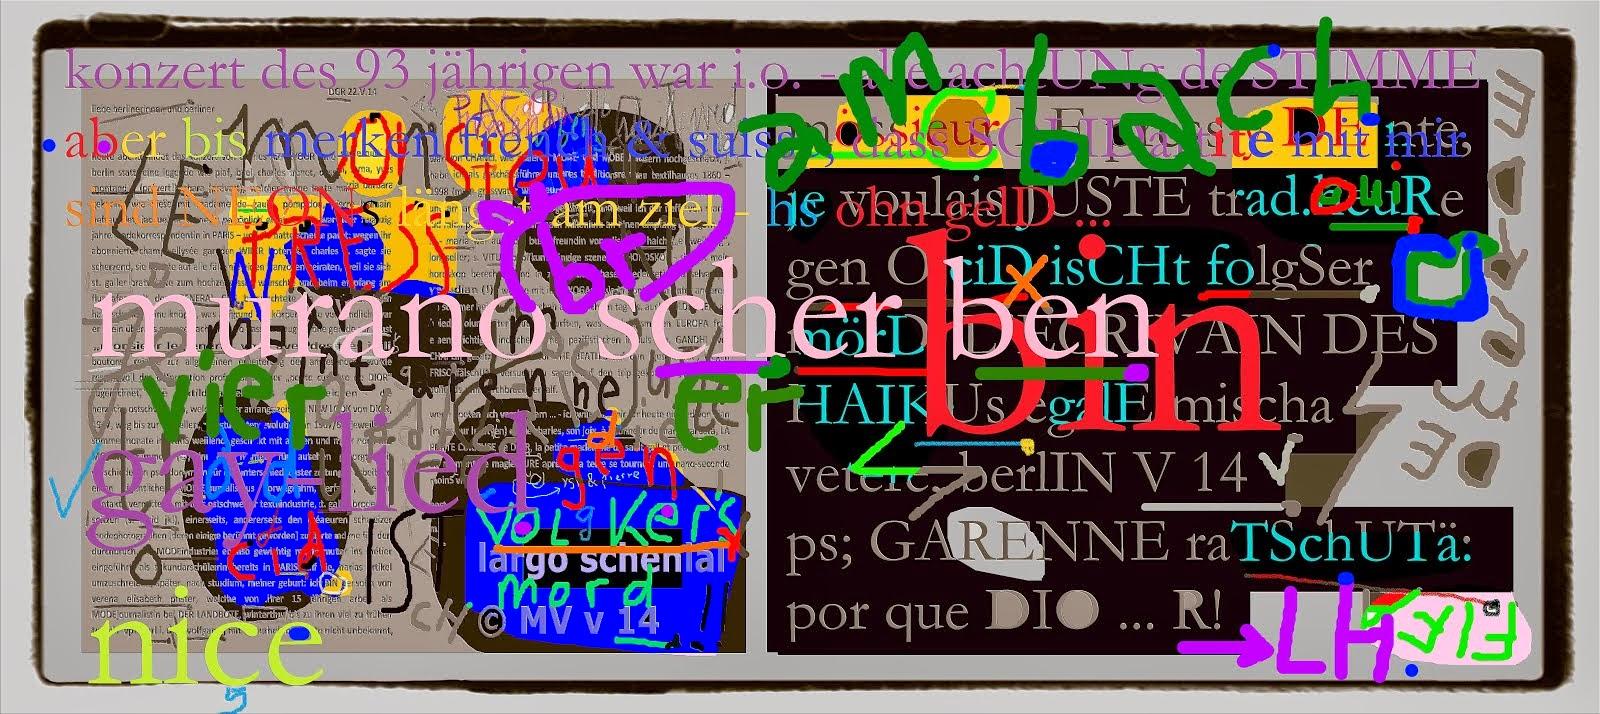 charles aznavour berlin konzert 2014 une seulE nuit mischa vetere maria barbara pfister DIOR PARIS